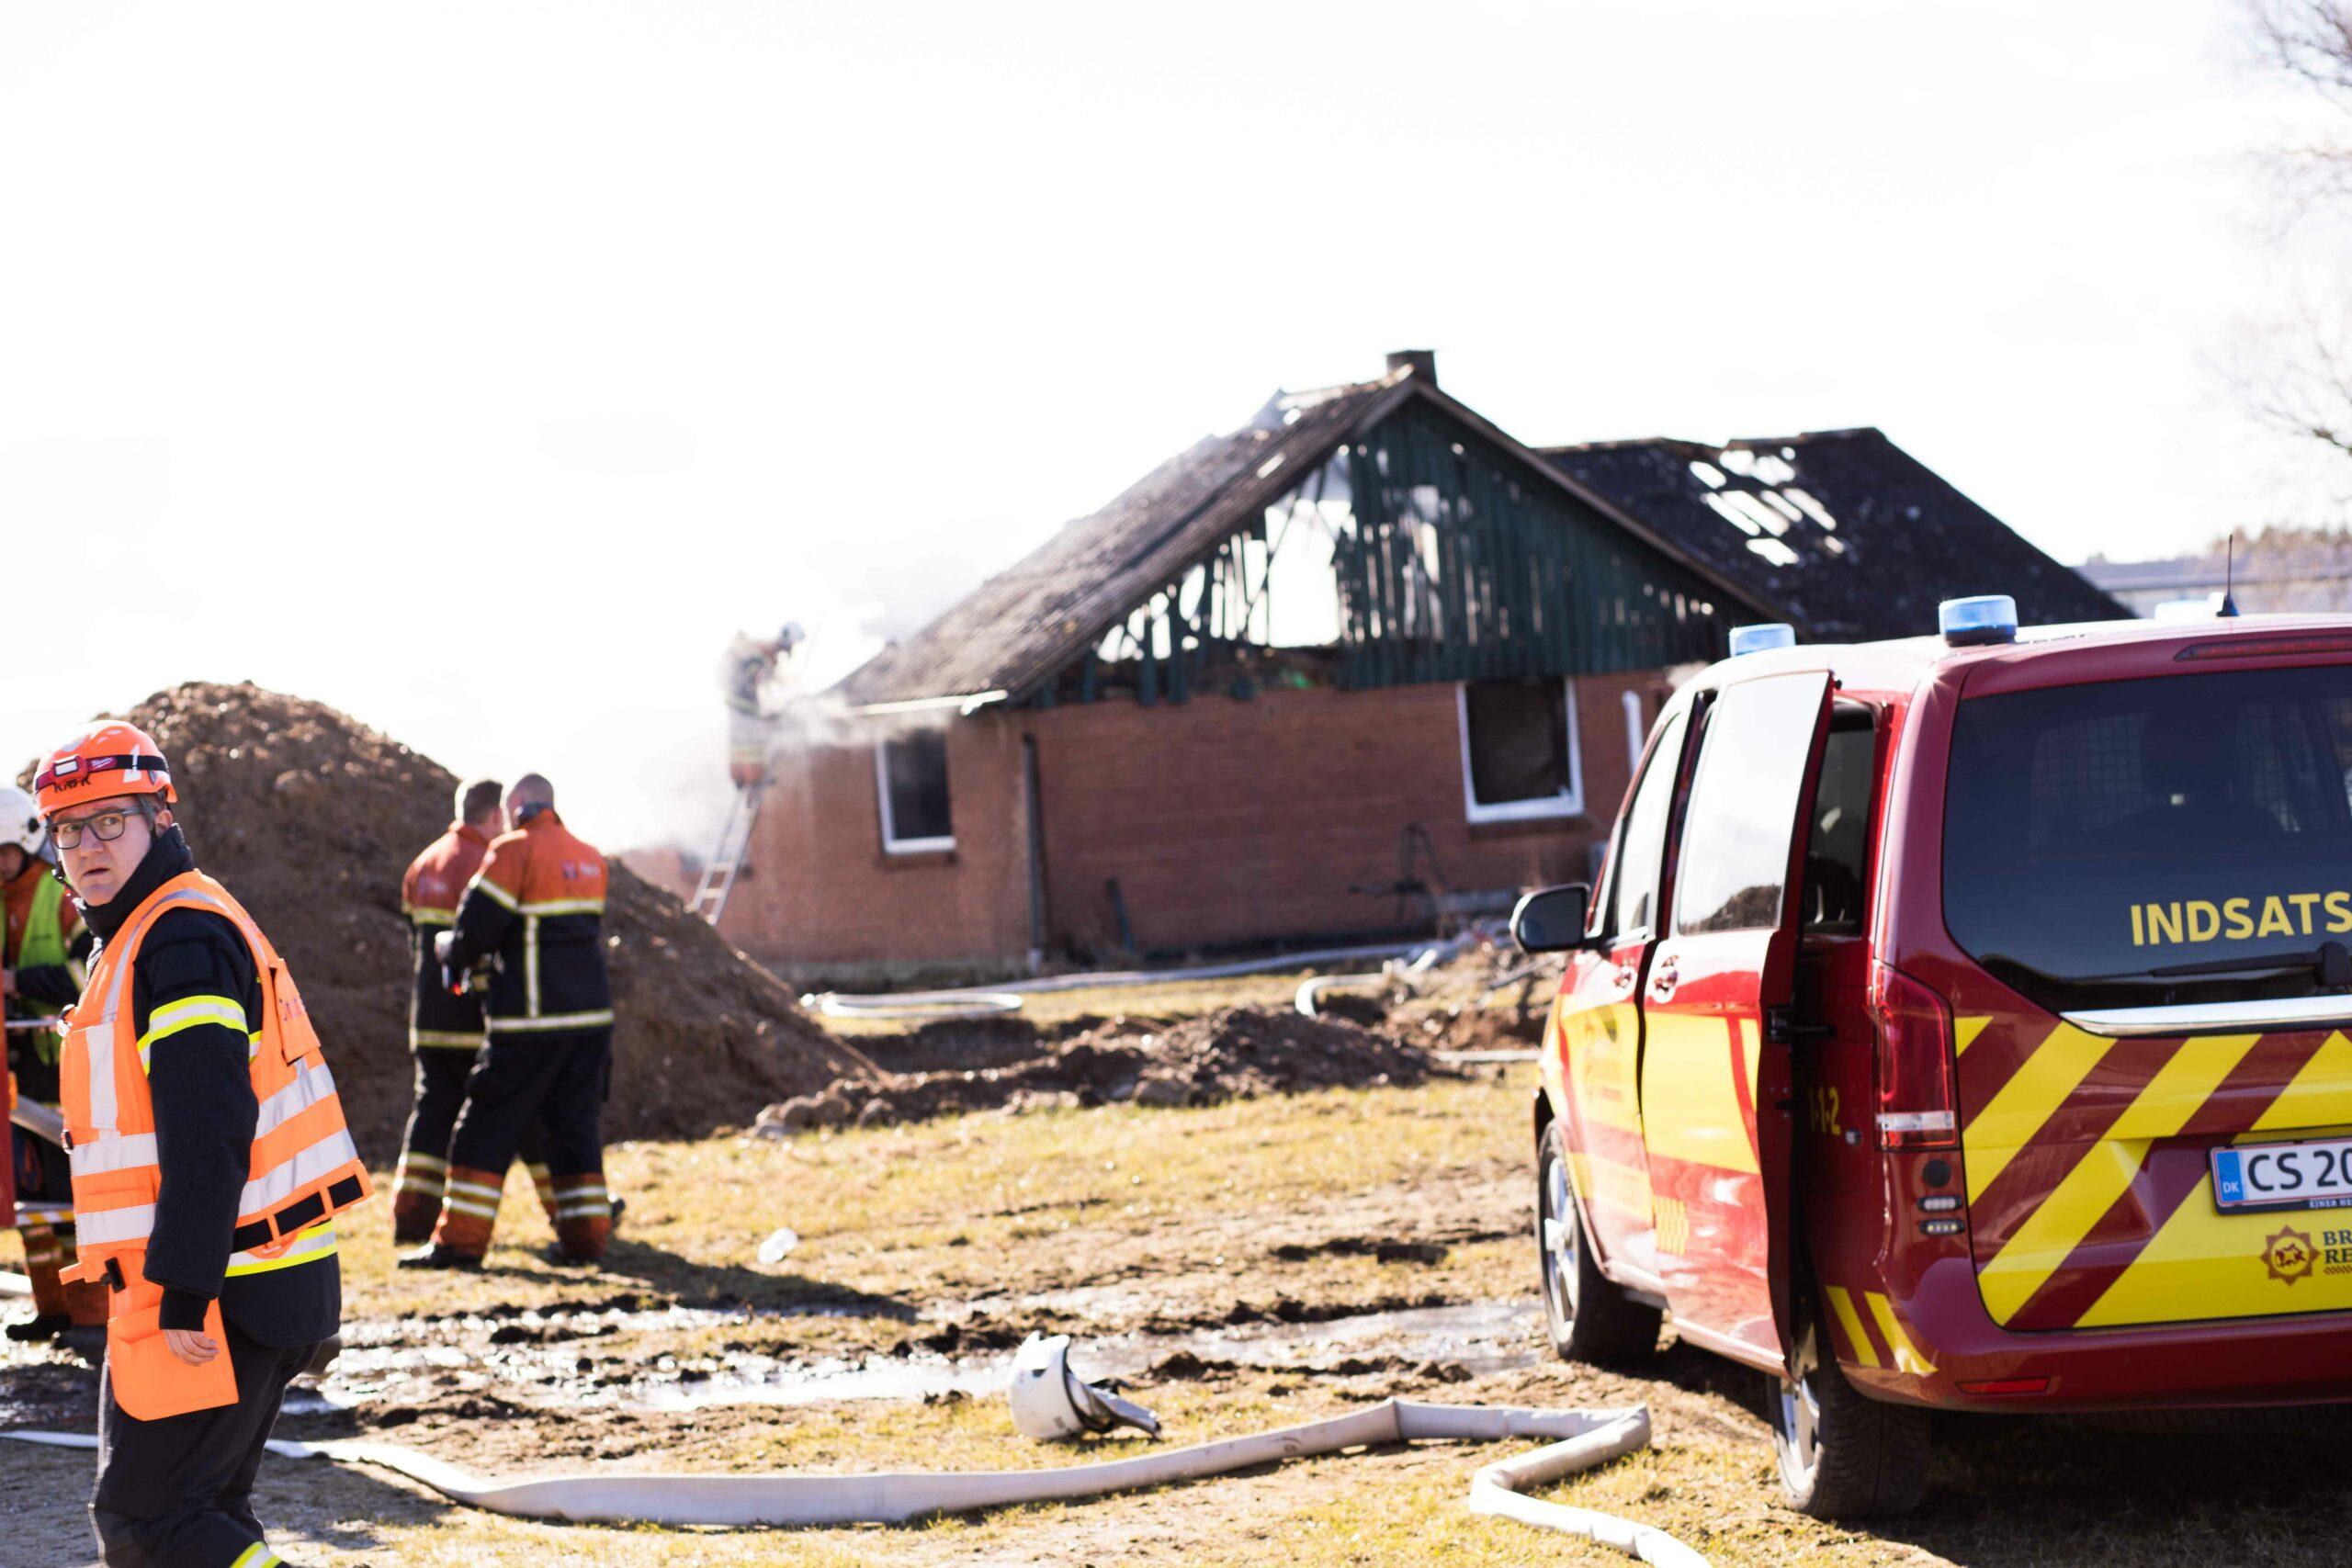 Kraftig bygningsbrand i Holstebro